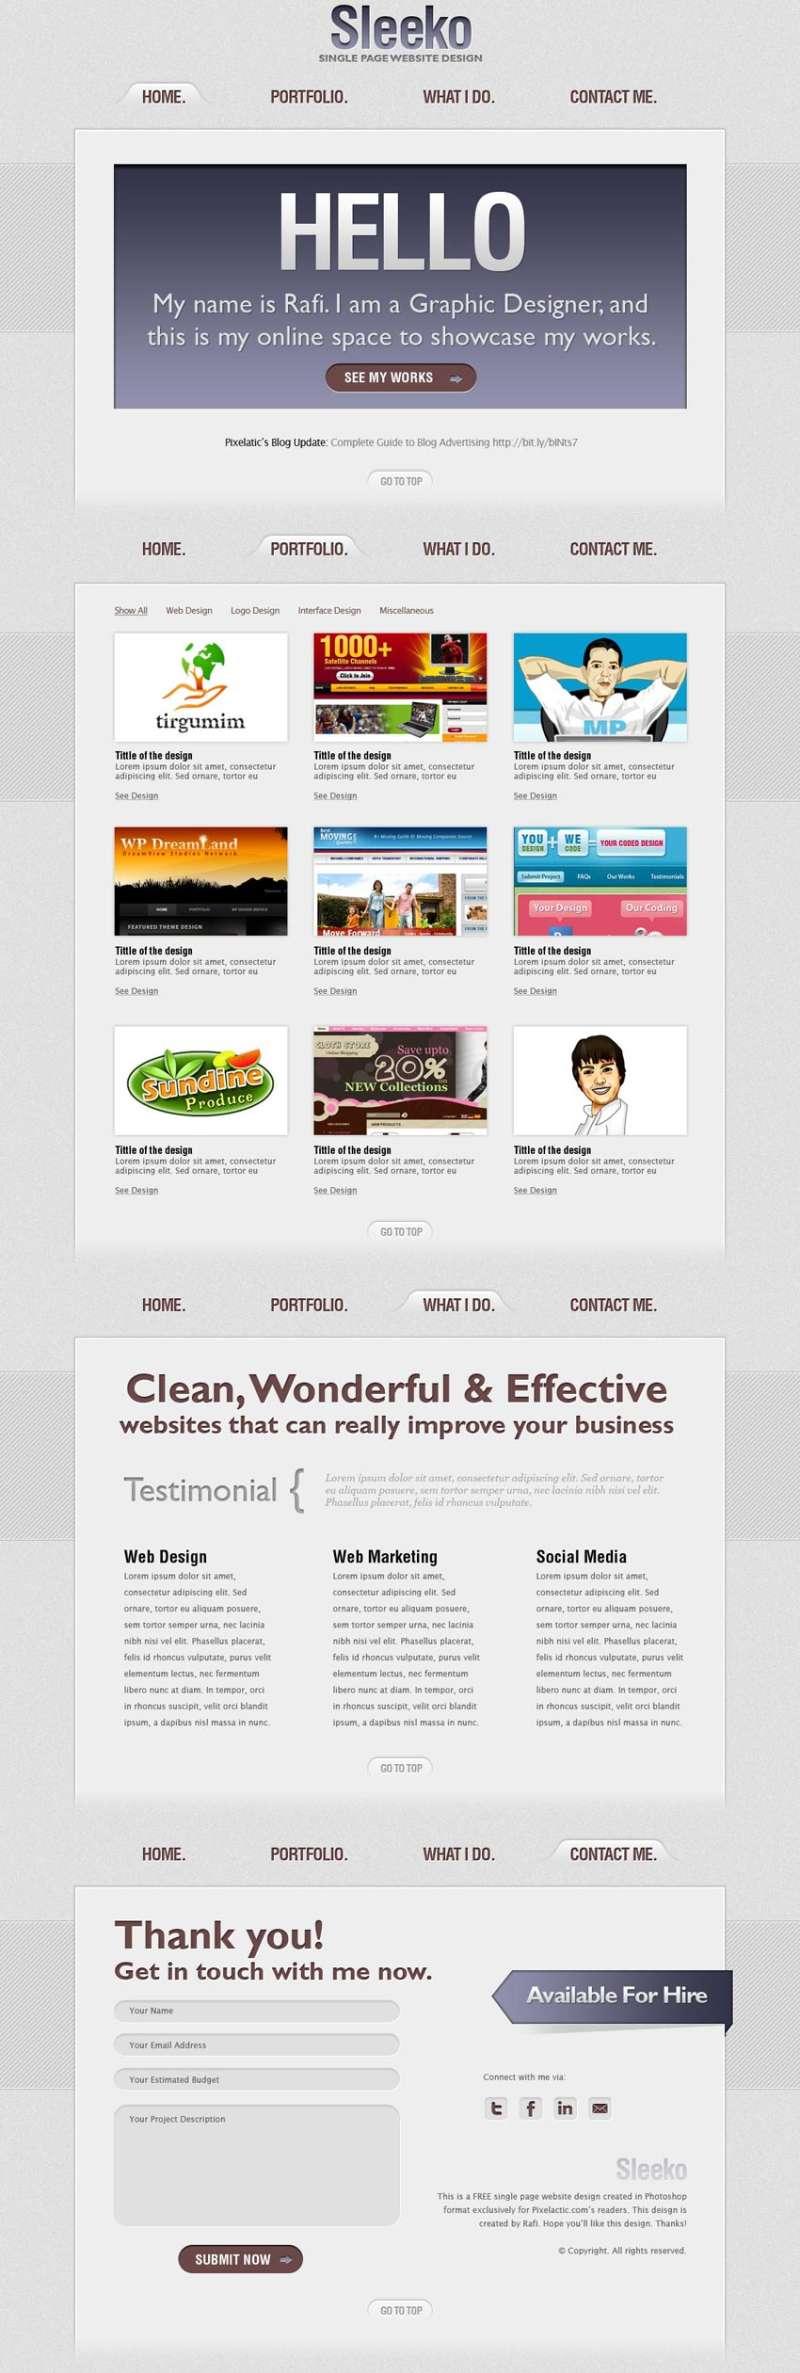 sleeko网页设计工作室个人网站模板PSD素材下载